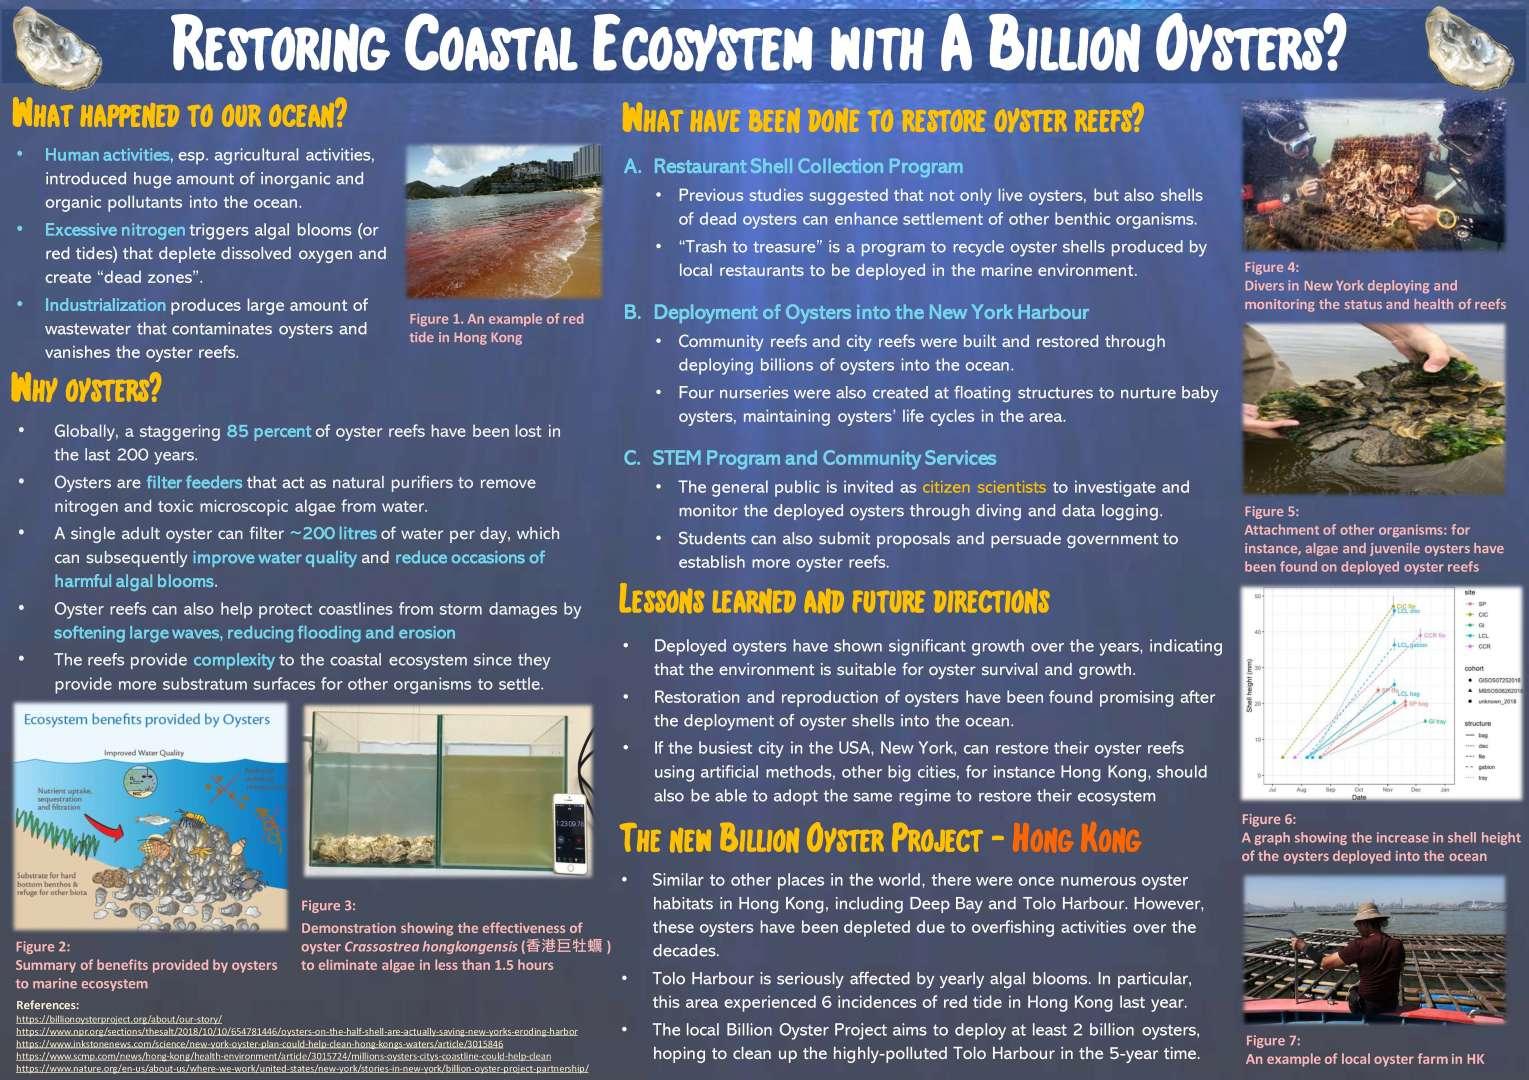 Restoring Coastal Ecosystem with A Billion Oysters